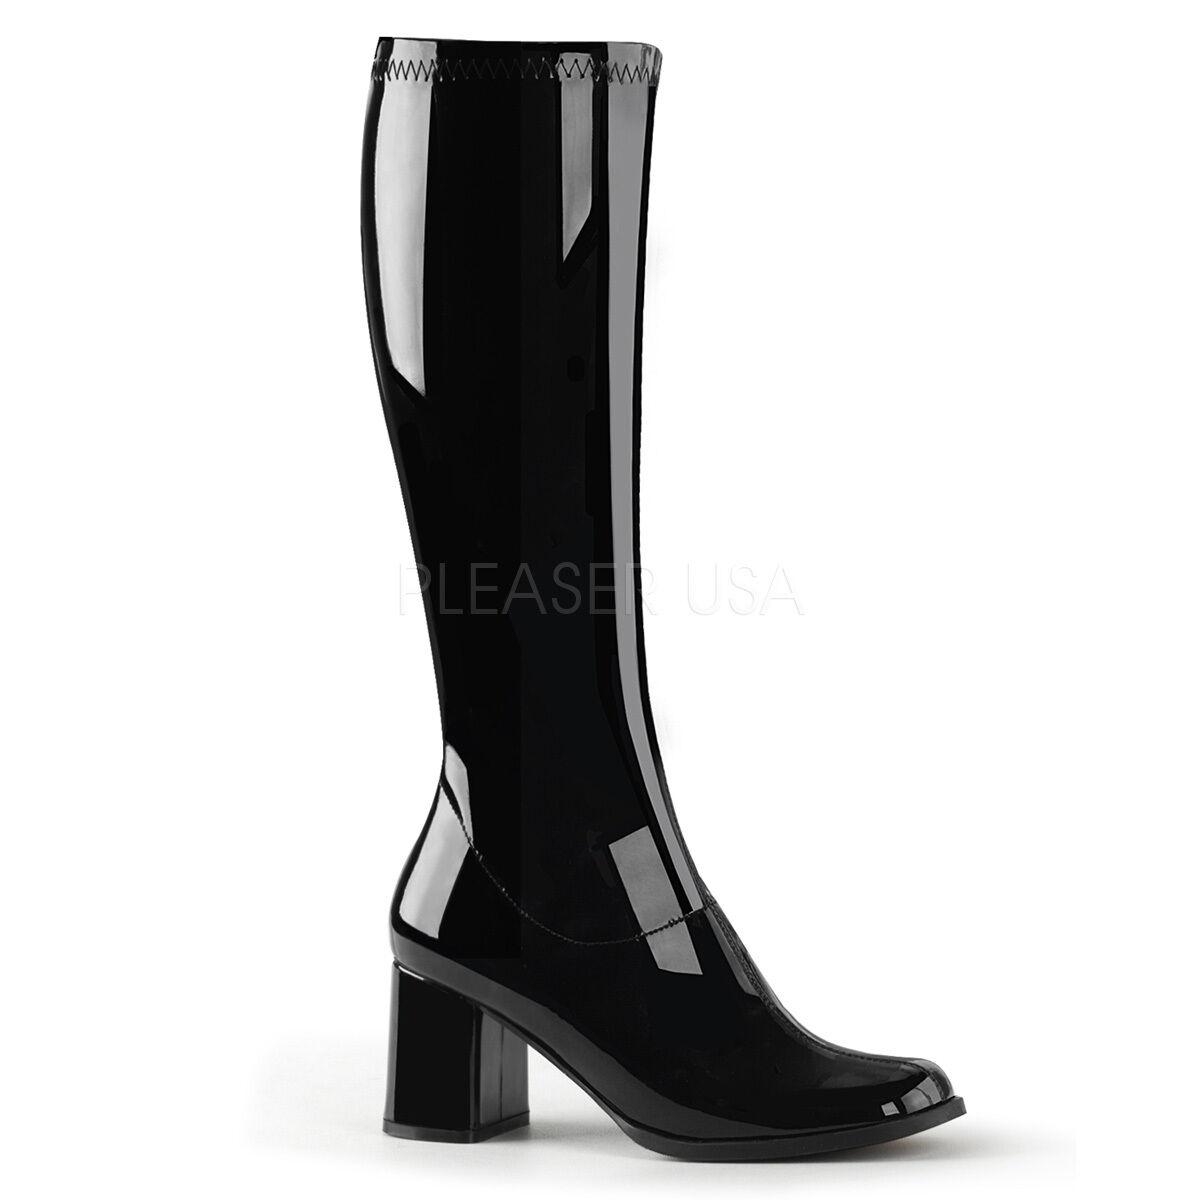 Pleaser Funtasma Gogo - 300 Negro Patente Elastizado 70s Discoteca Disfraz Rodilla Botas